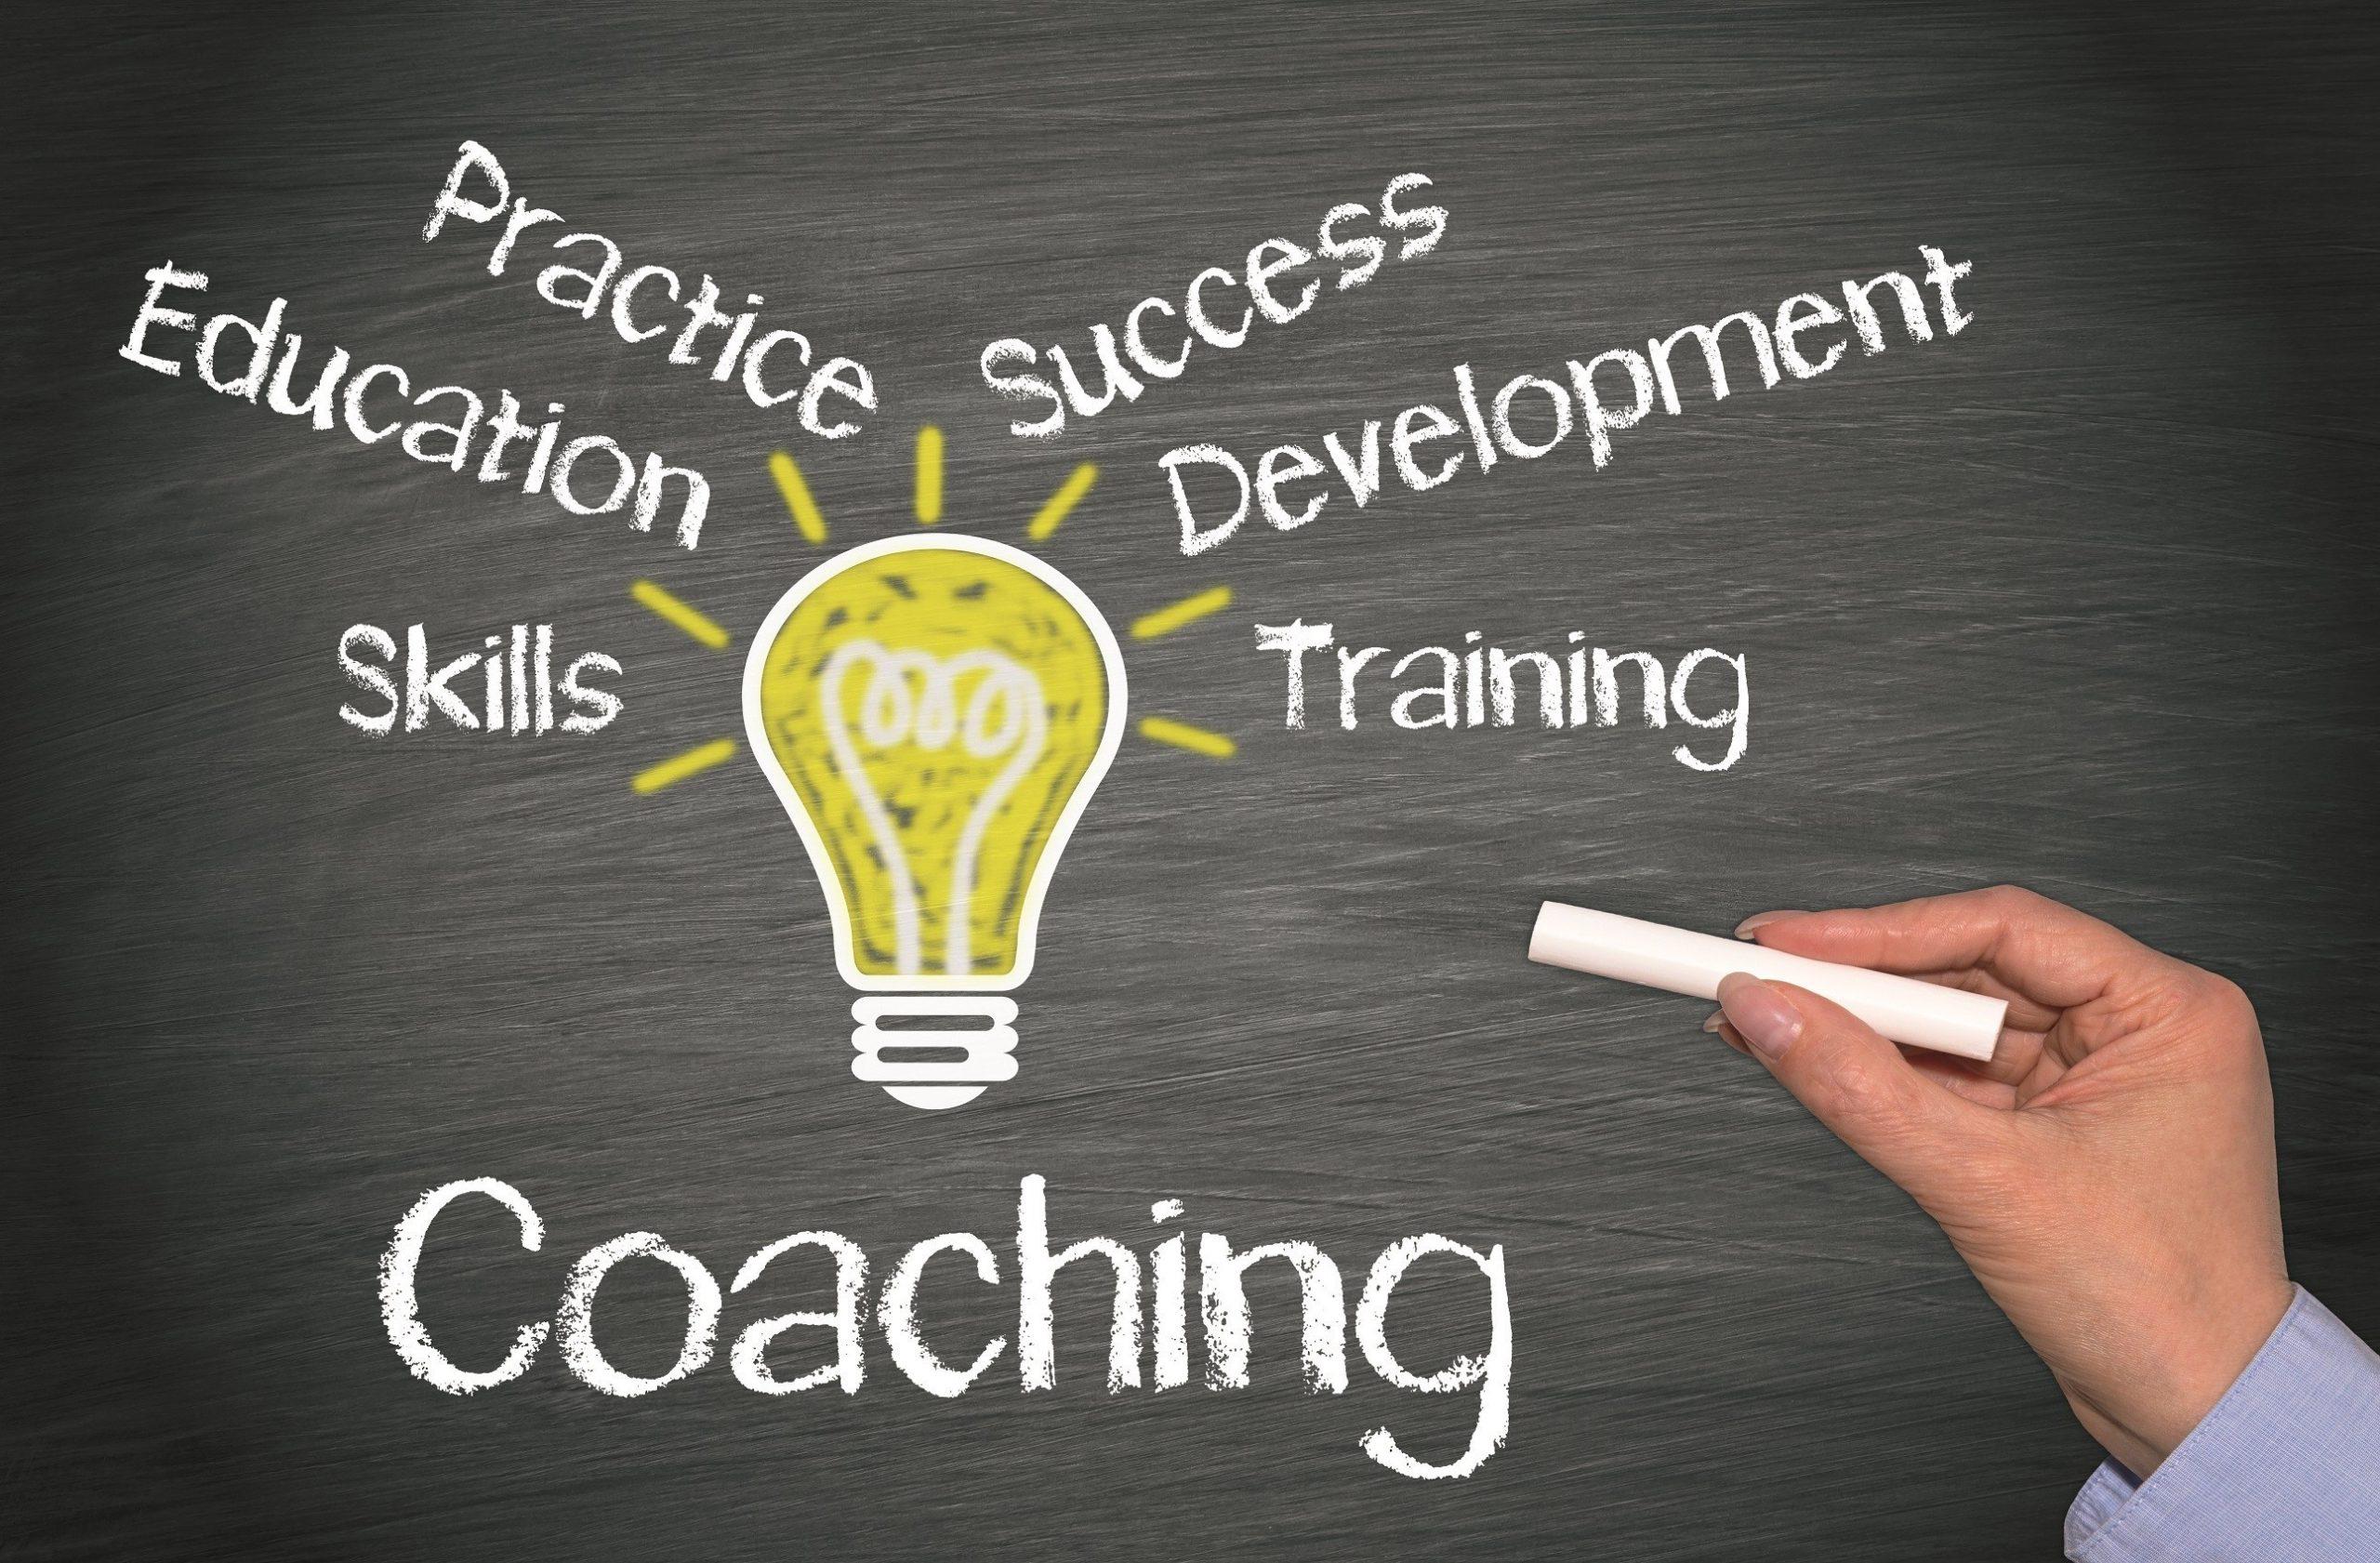 Fondamenti di coaching – applicazioni e professione del coach